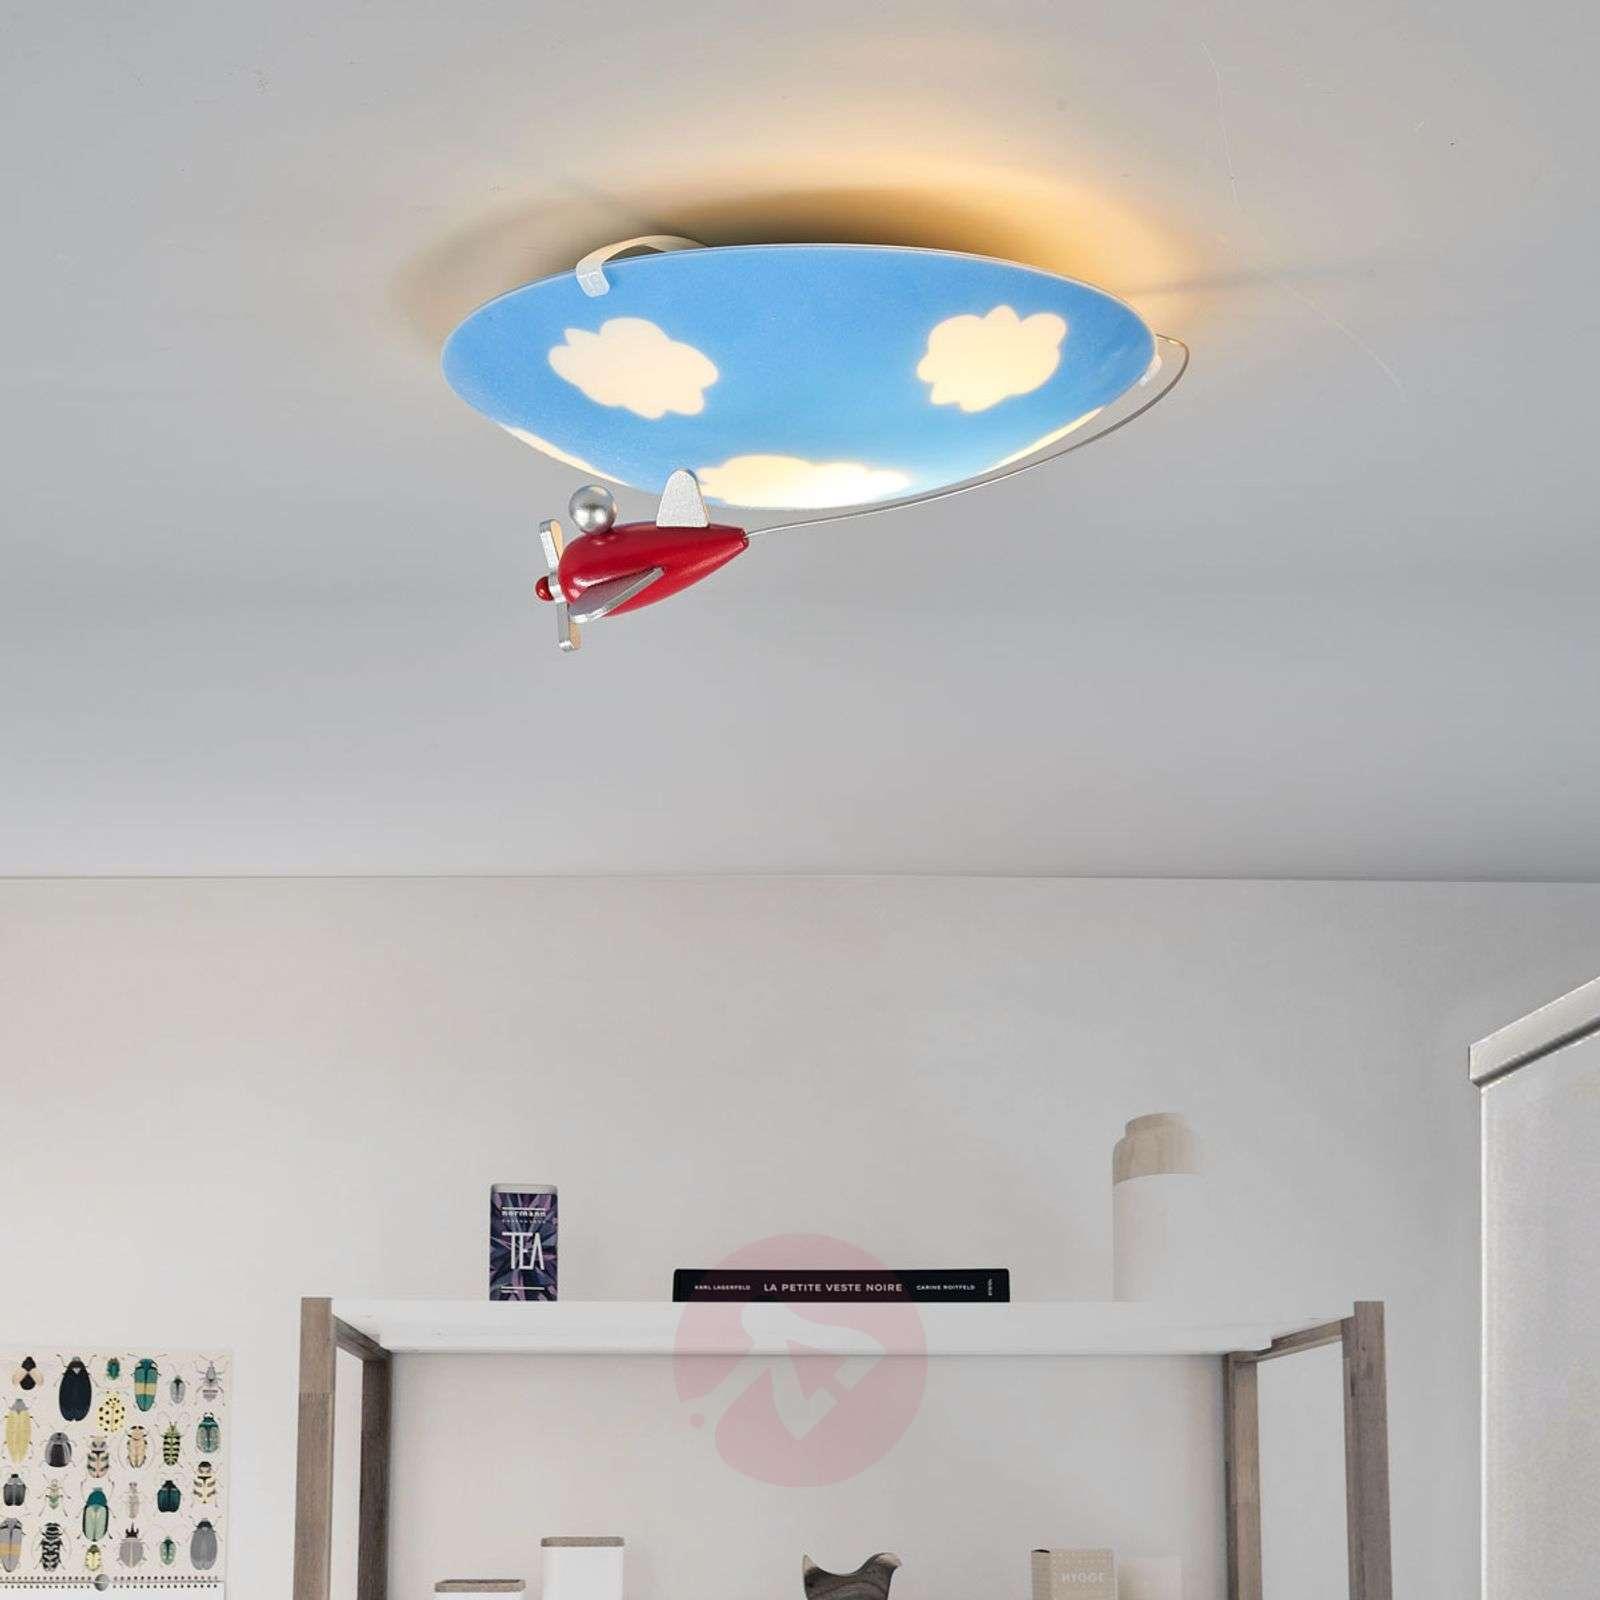 Childrens ceiling/wall light SKY-6500605-01